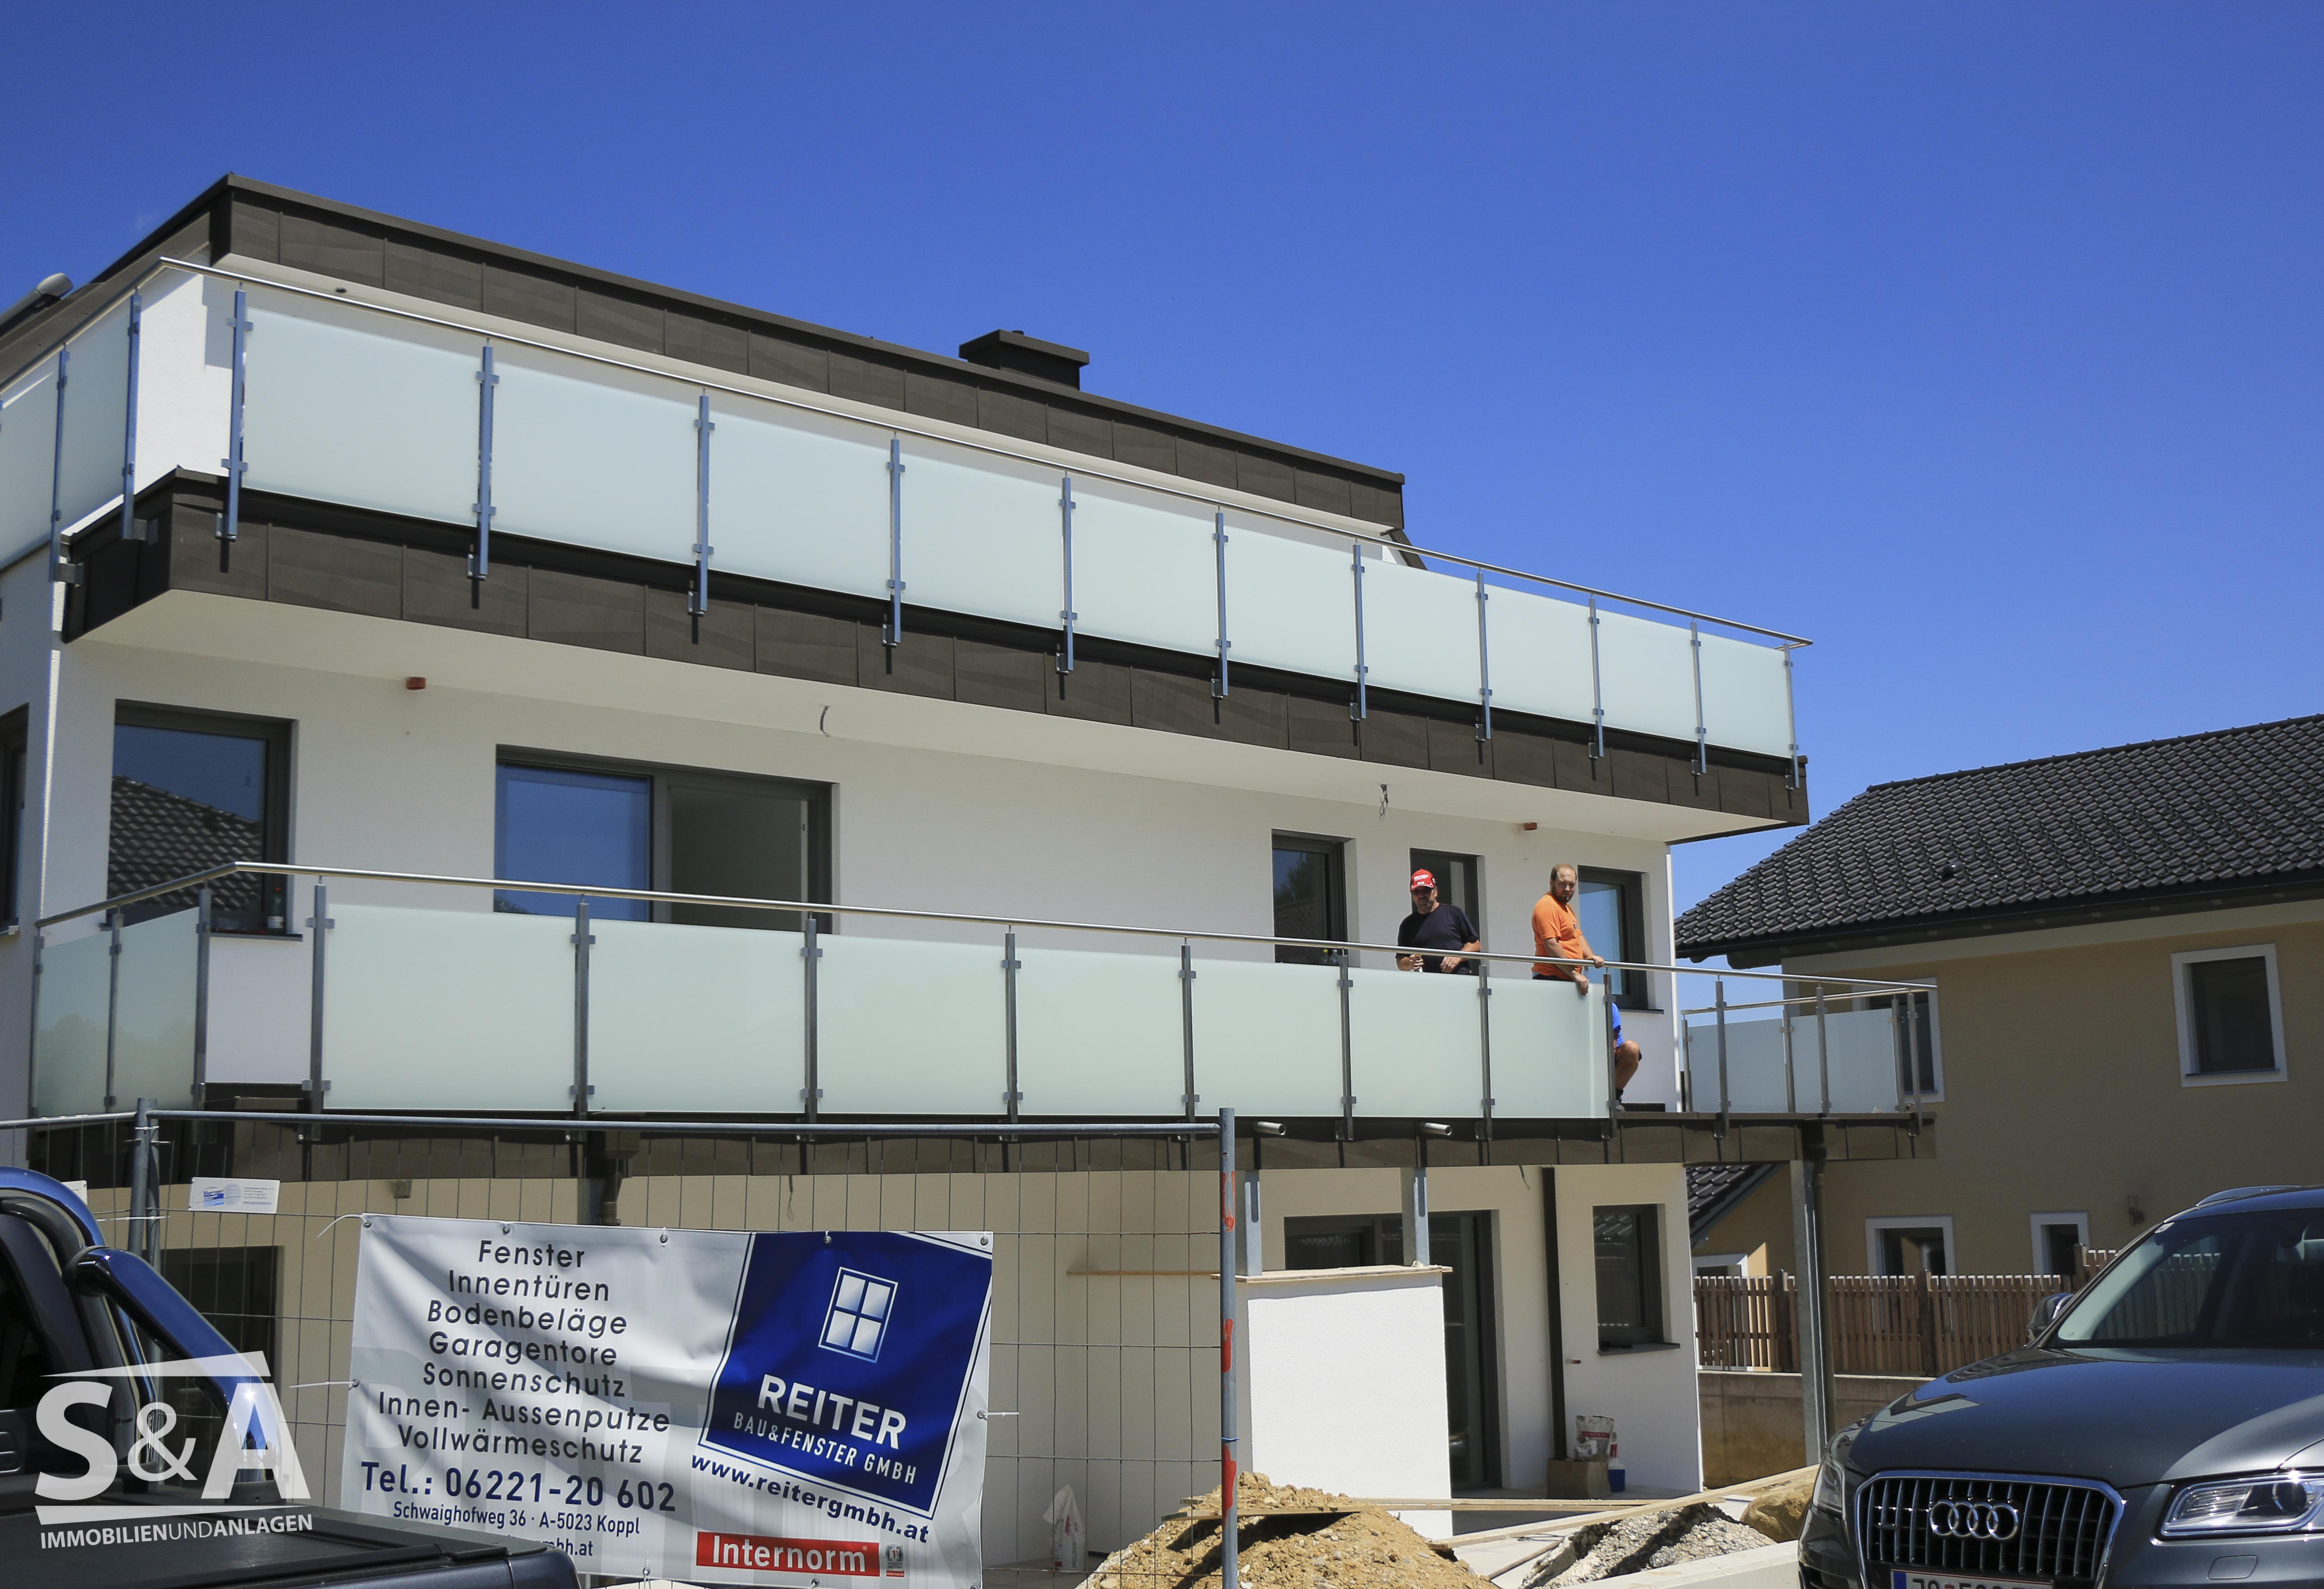 S&A Immobilien_Kraiham-12